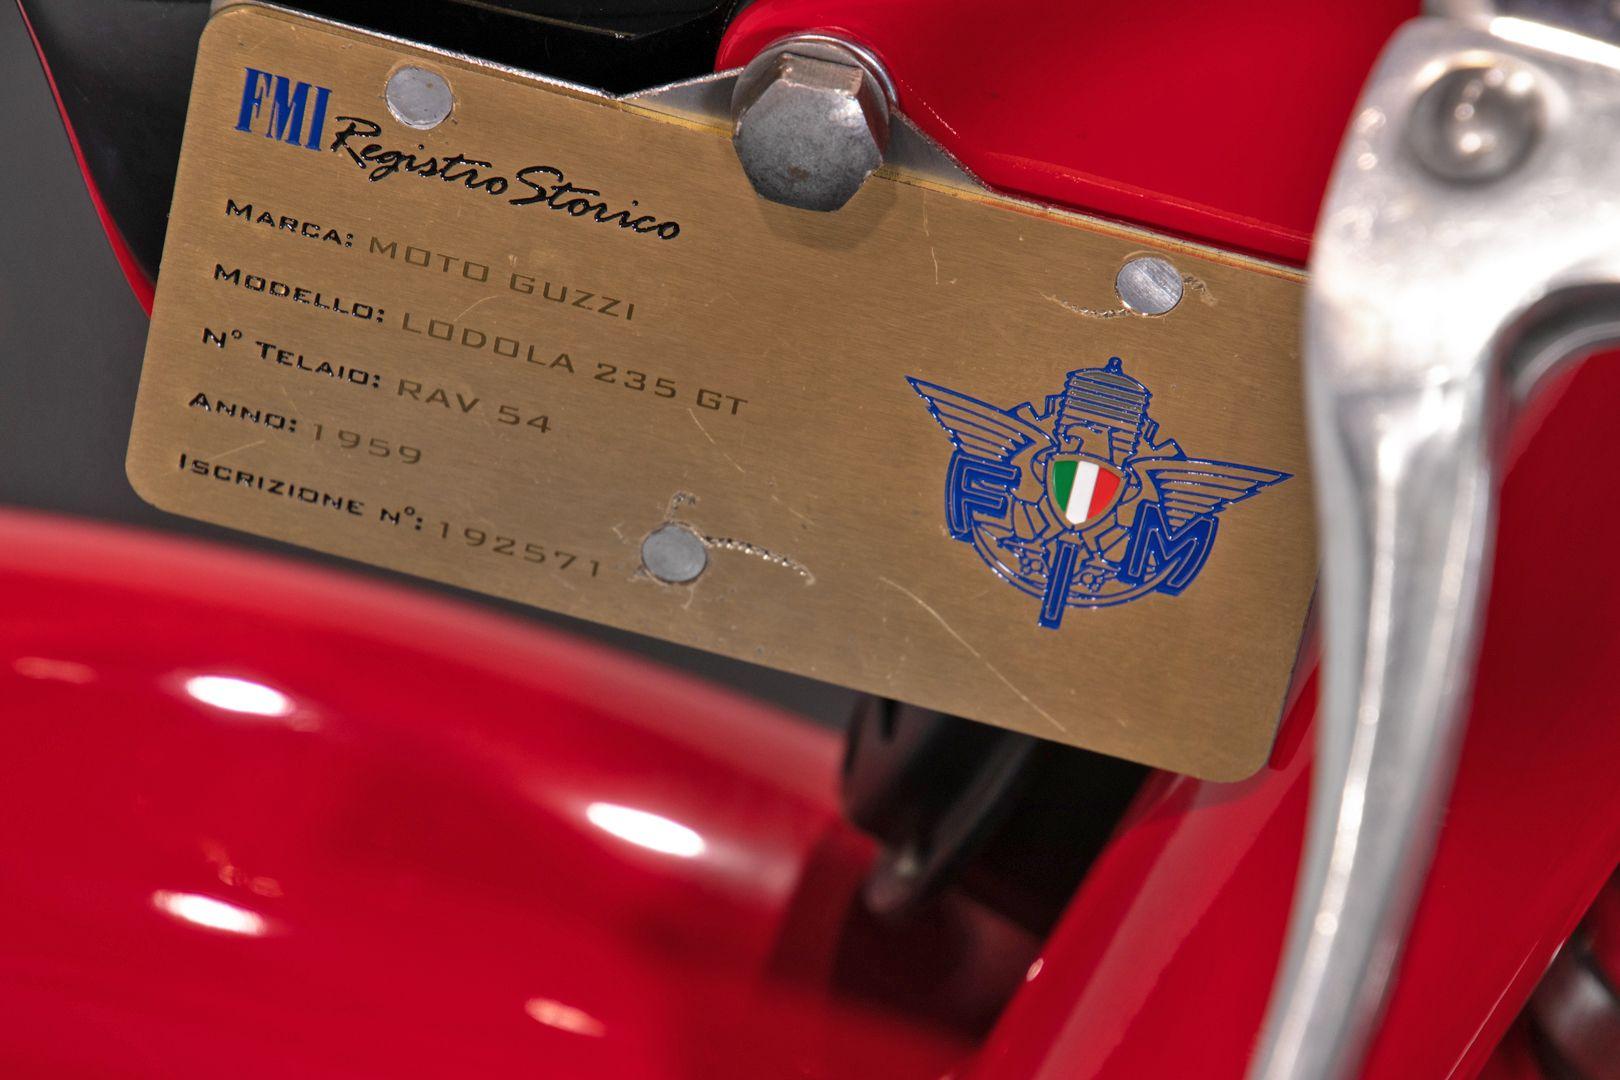 1959 Moto Guzzi Lodola 235 GT 41889